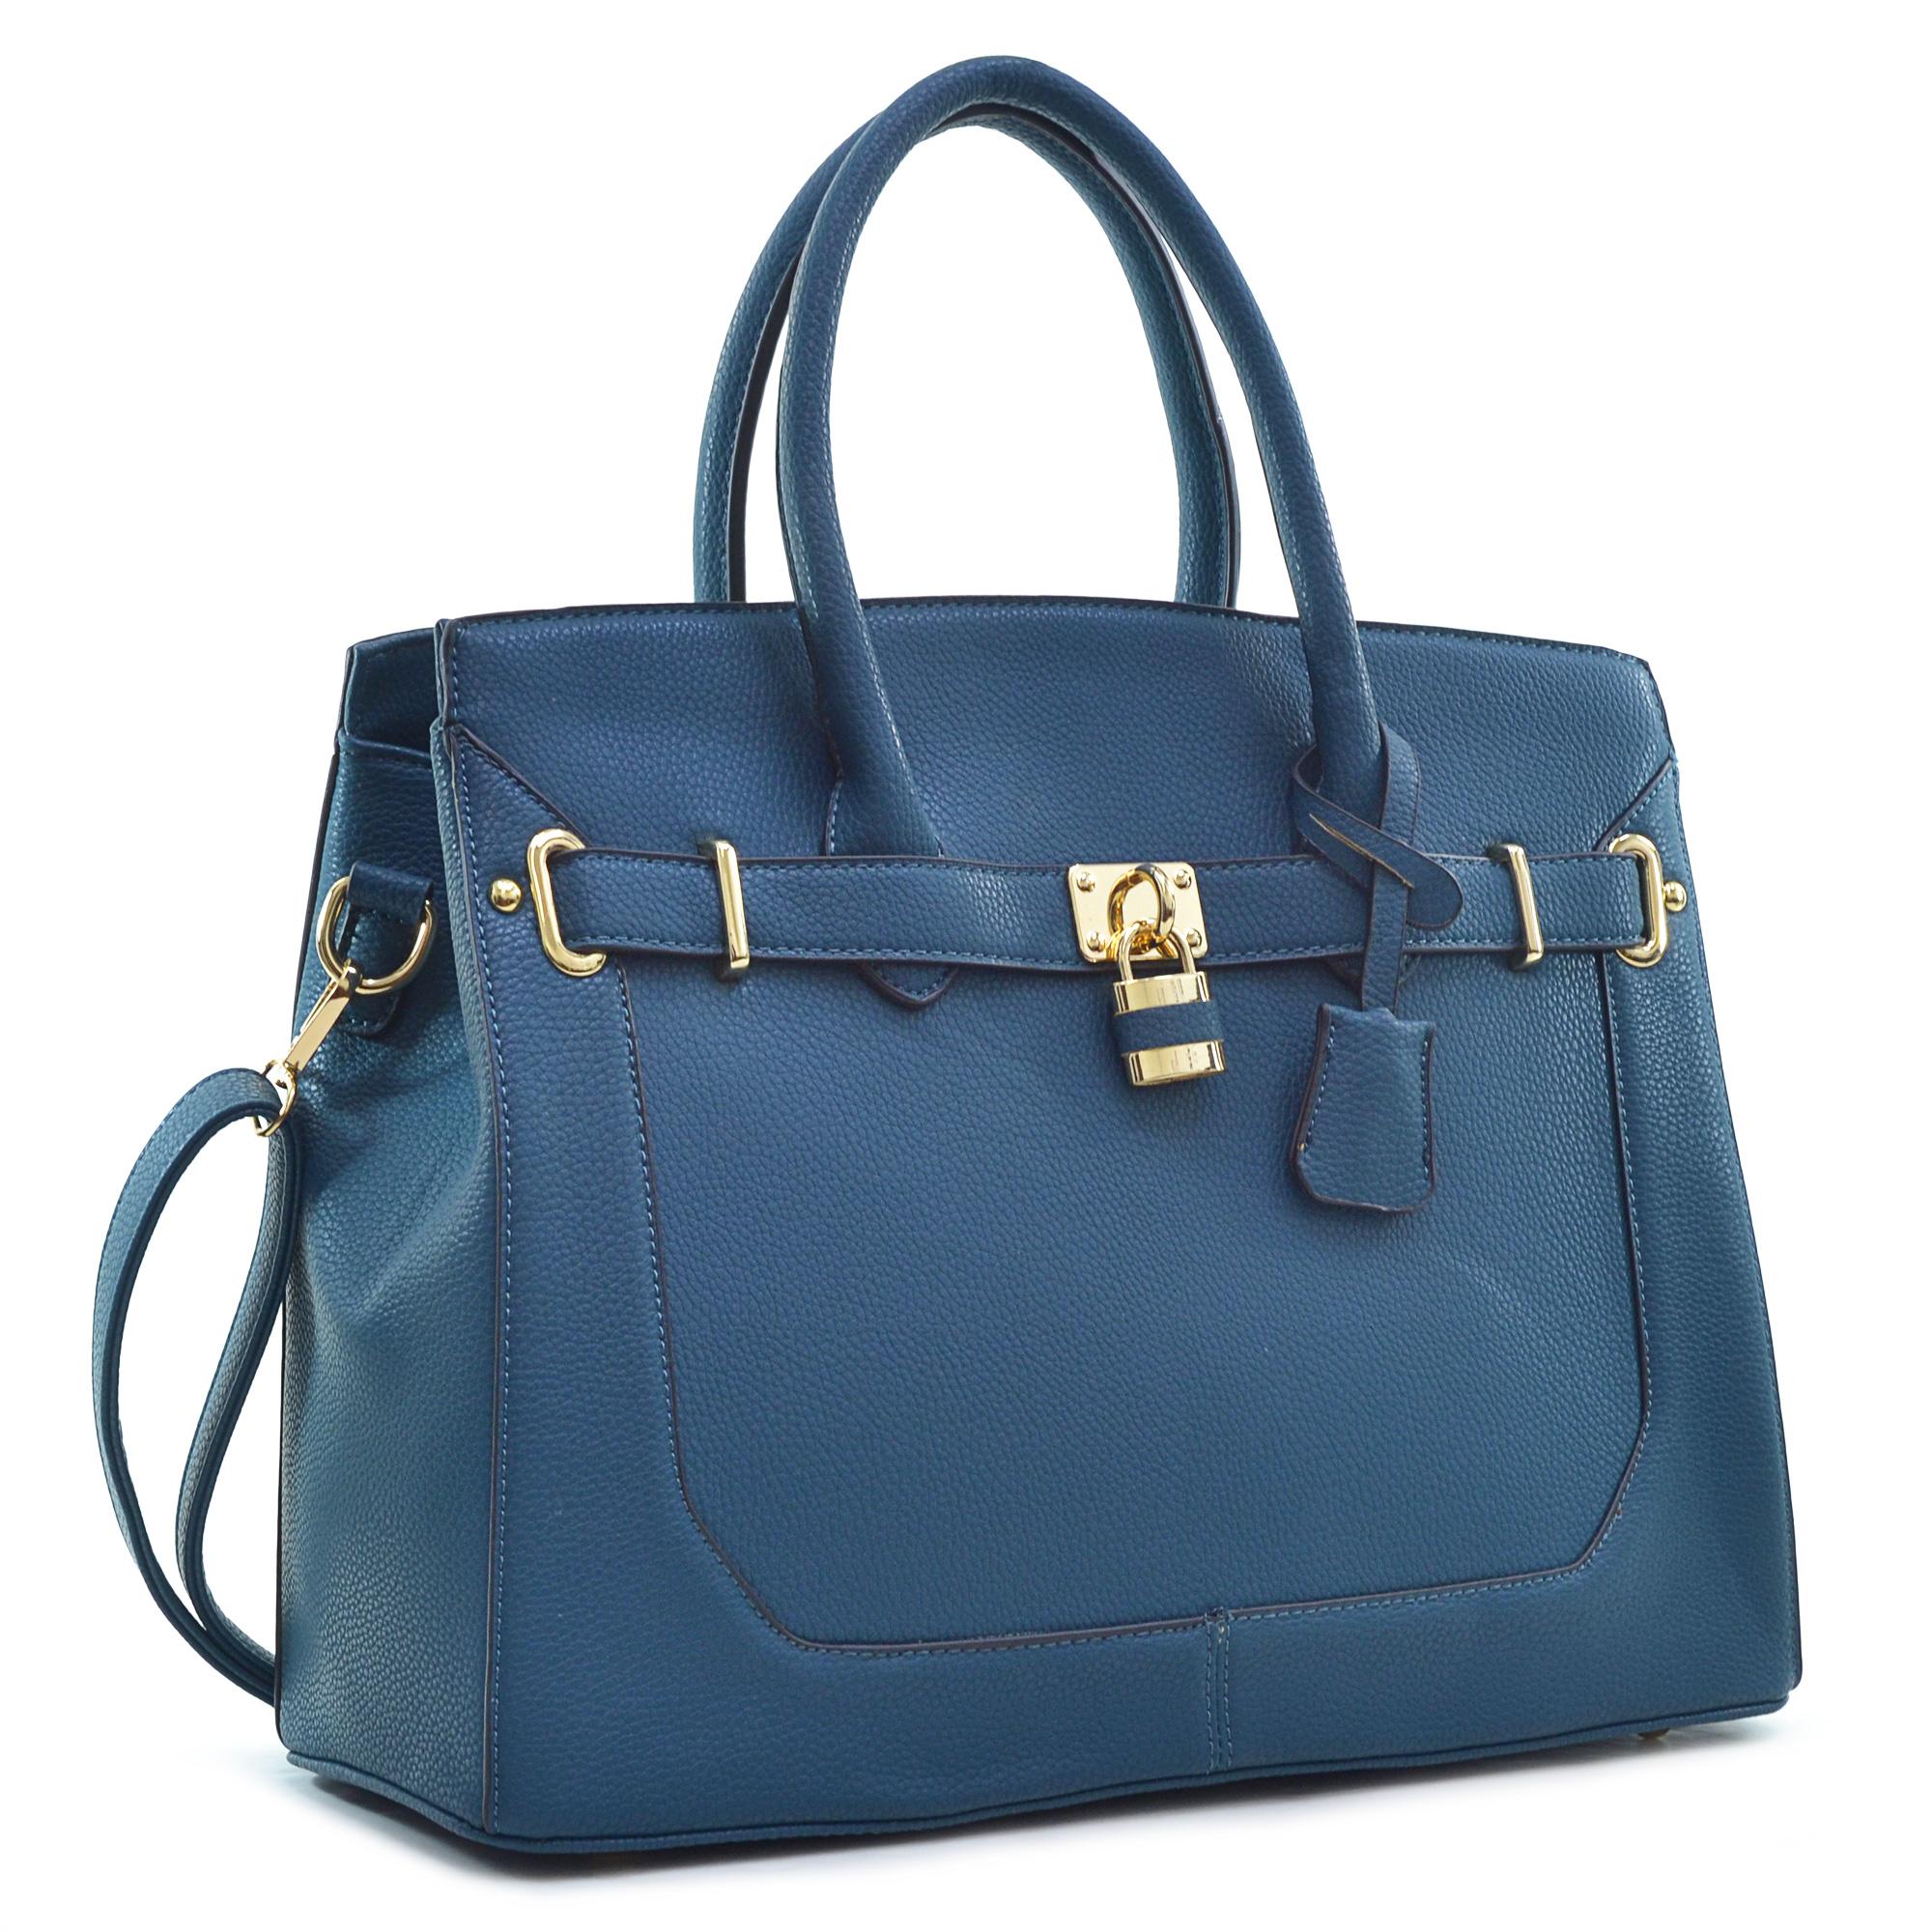 c03dd72170 Saffiano Birkin Style Padlock And Key Handbag With Cross Body